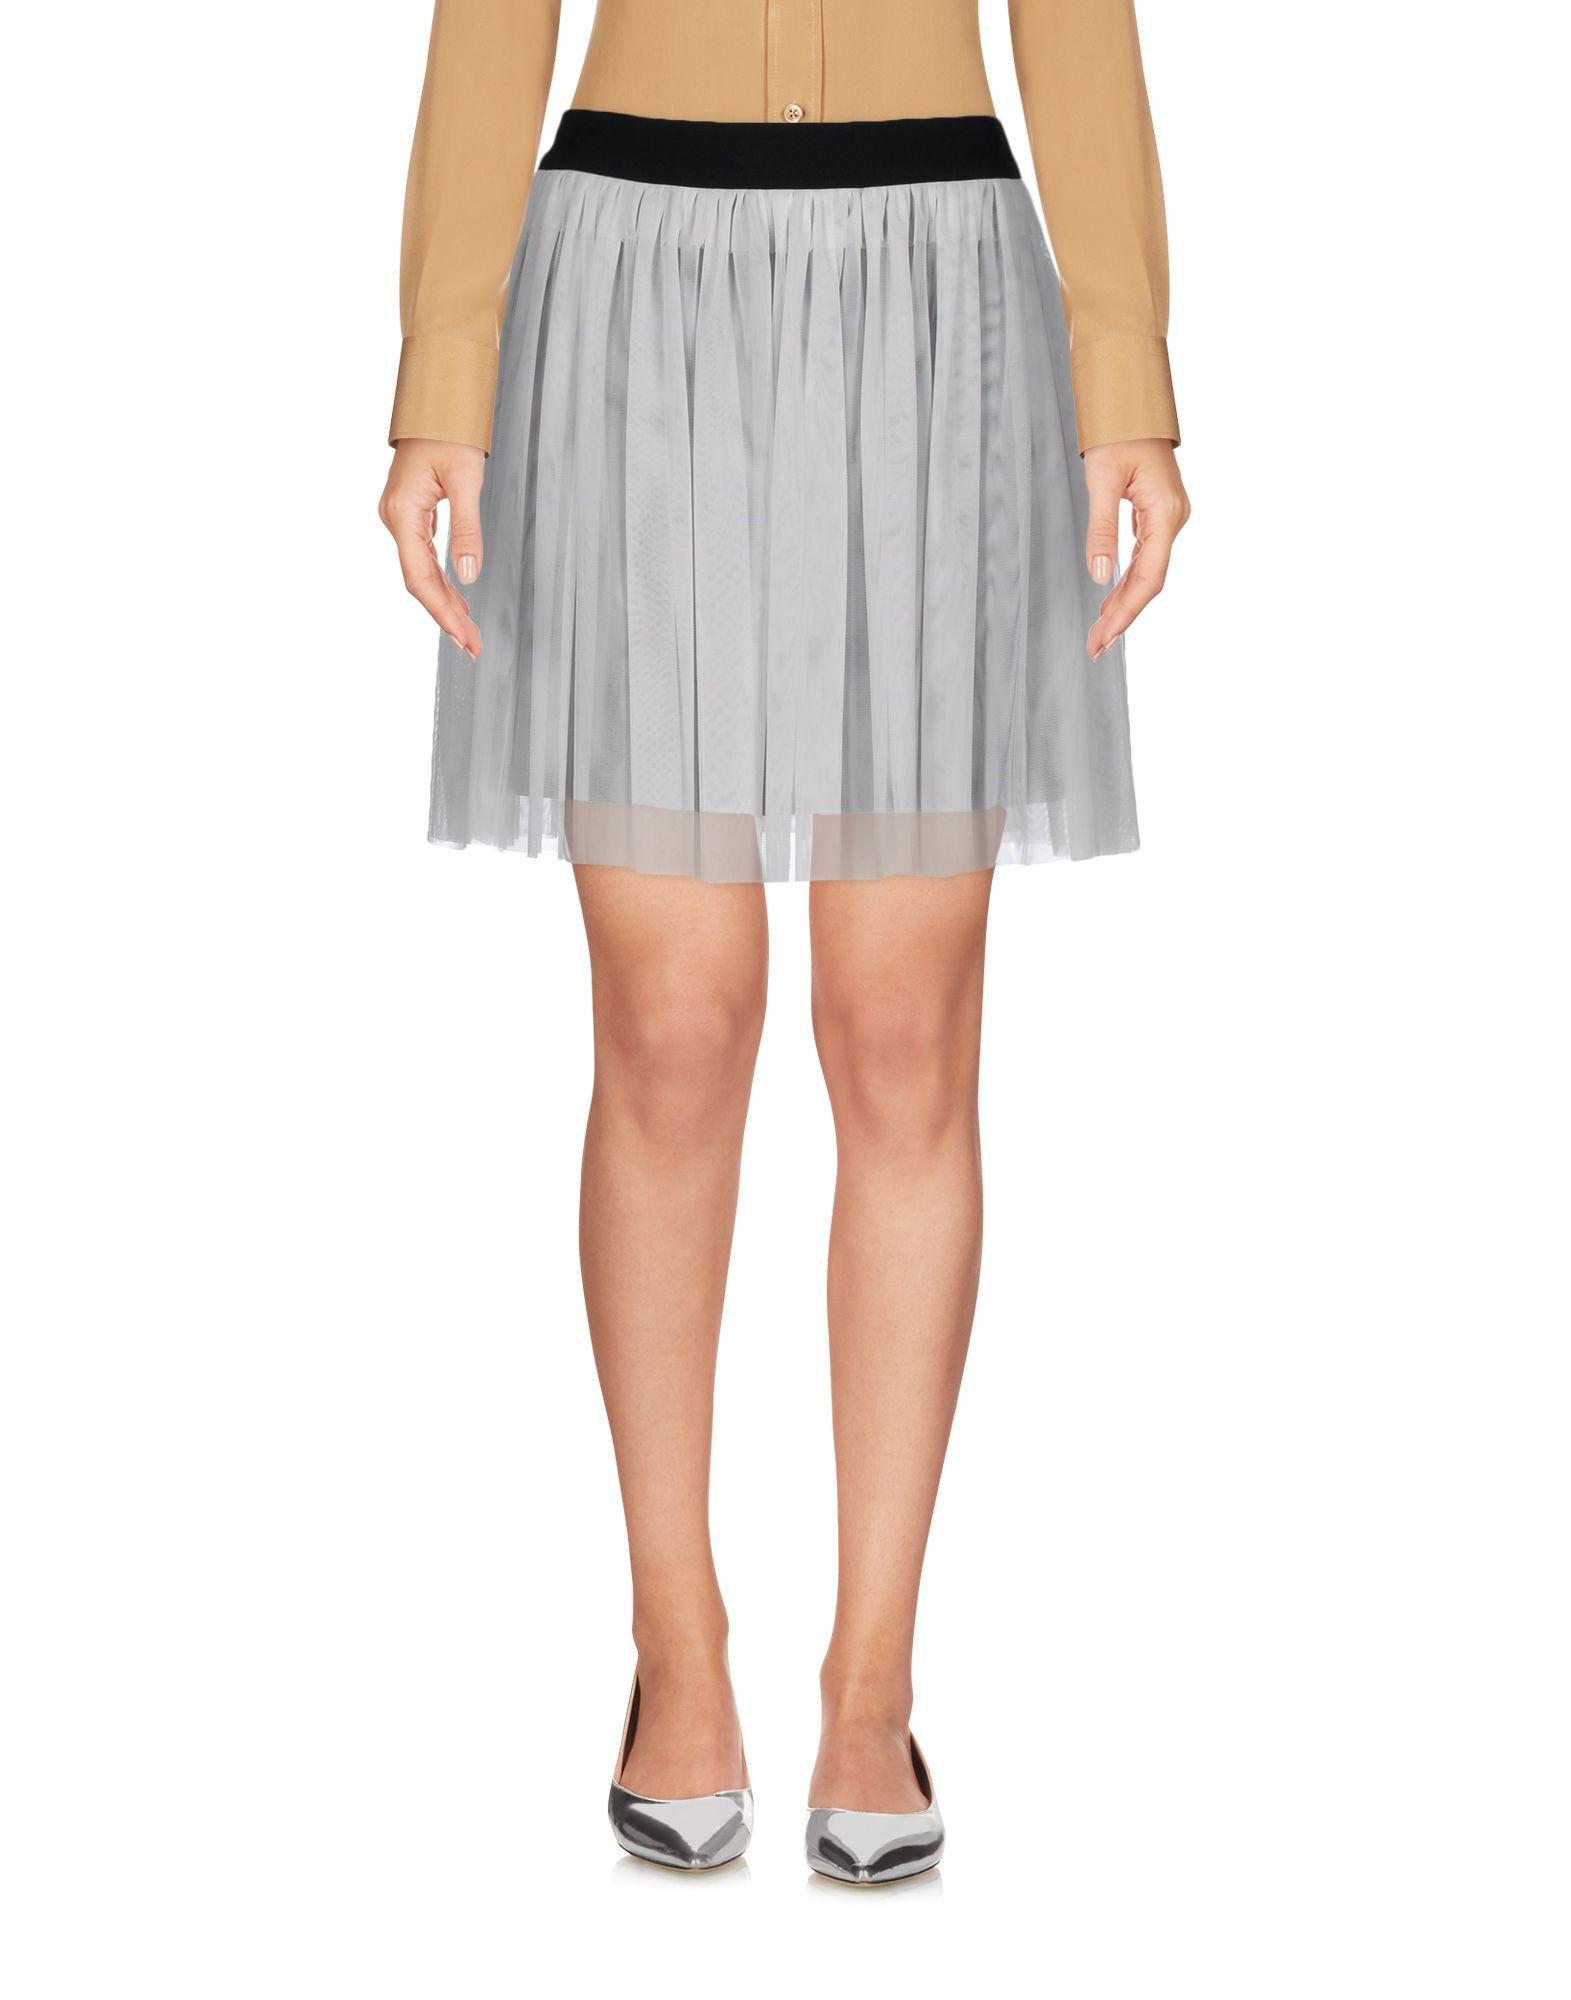 ANIYE BY Damen Minirock Farbe Weiß Größe 4